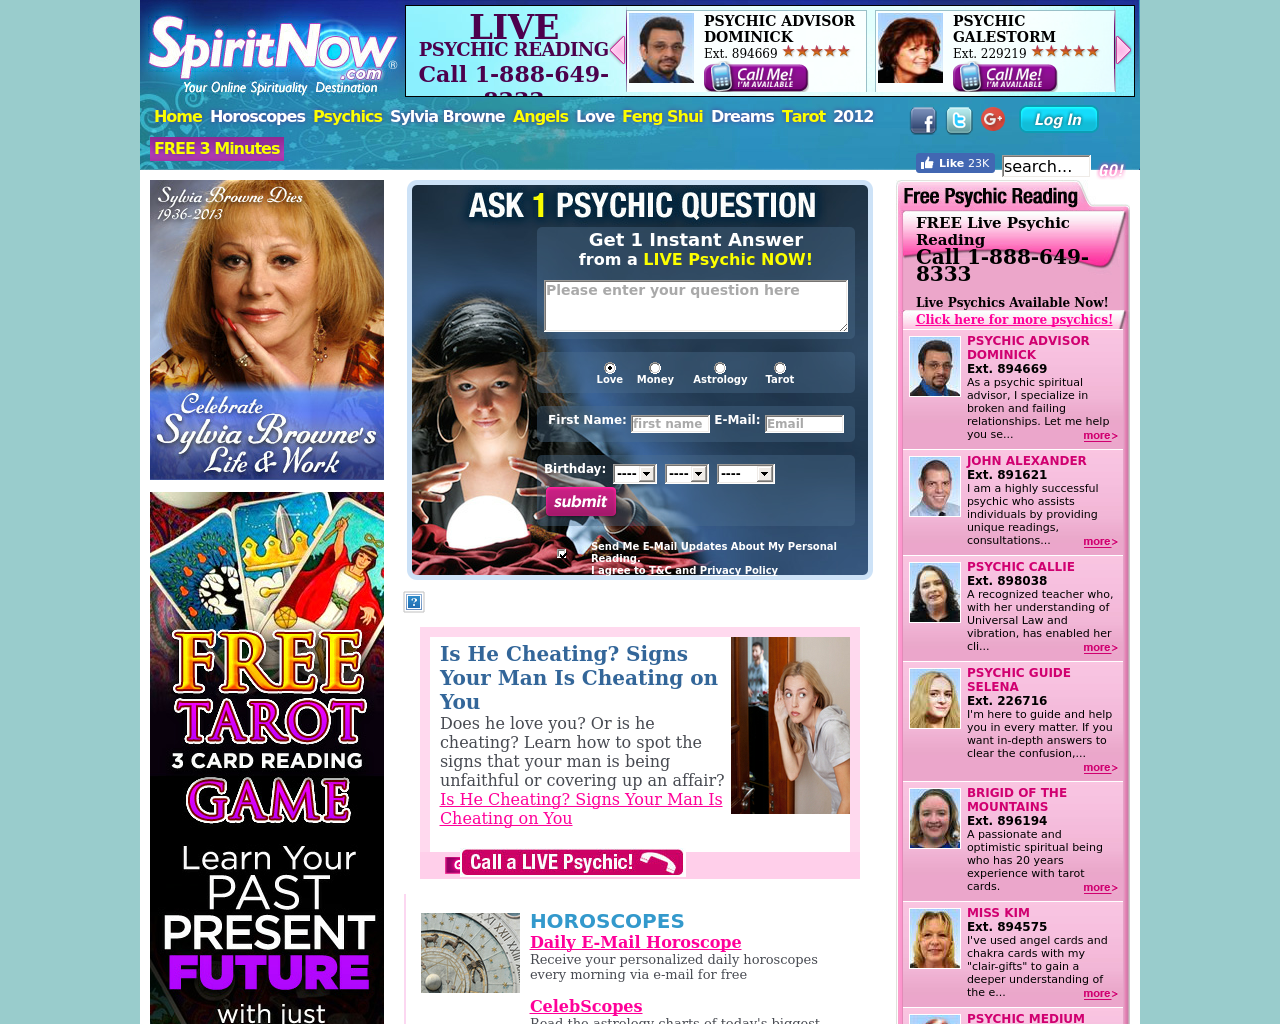 SpiritNow-Advertising-Reviews-Pricing